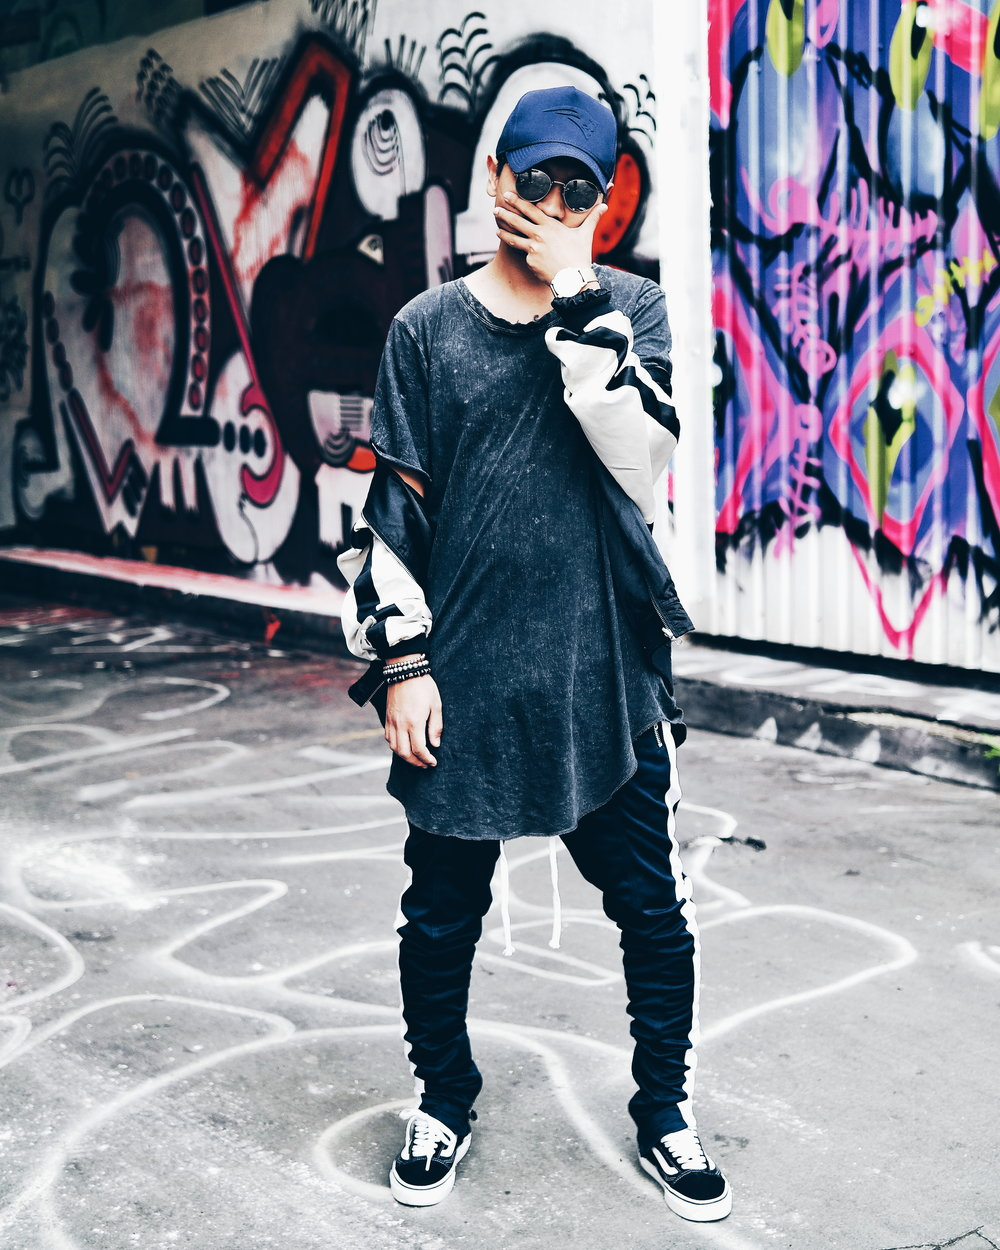 Men's Summer Streetwear,Men's Summer Street Style,Fashion From Norway,Thai Fashion Blogger,July Fashion,Summer Fashion Inspiration,Men's Street Outfits,European Street Style,Teddy Upacut 3